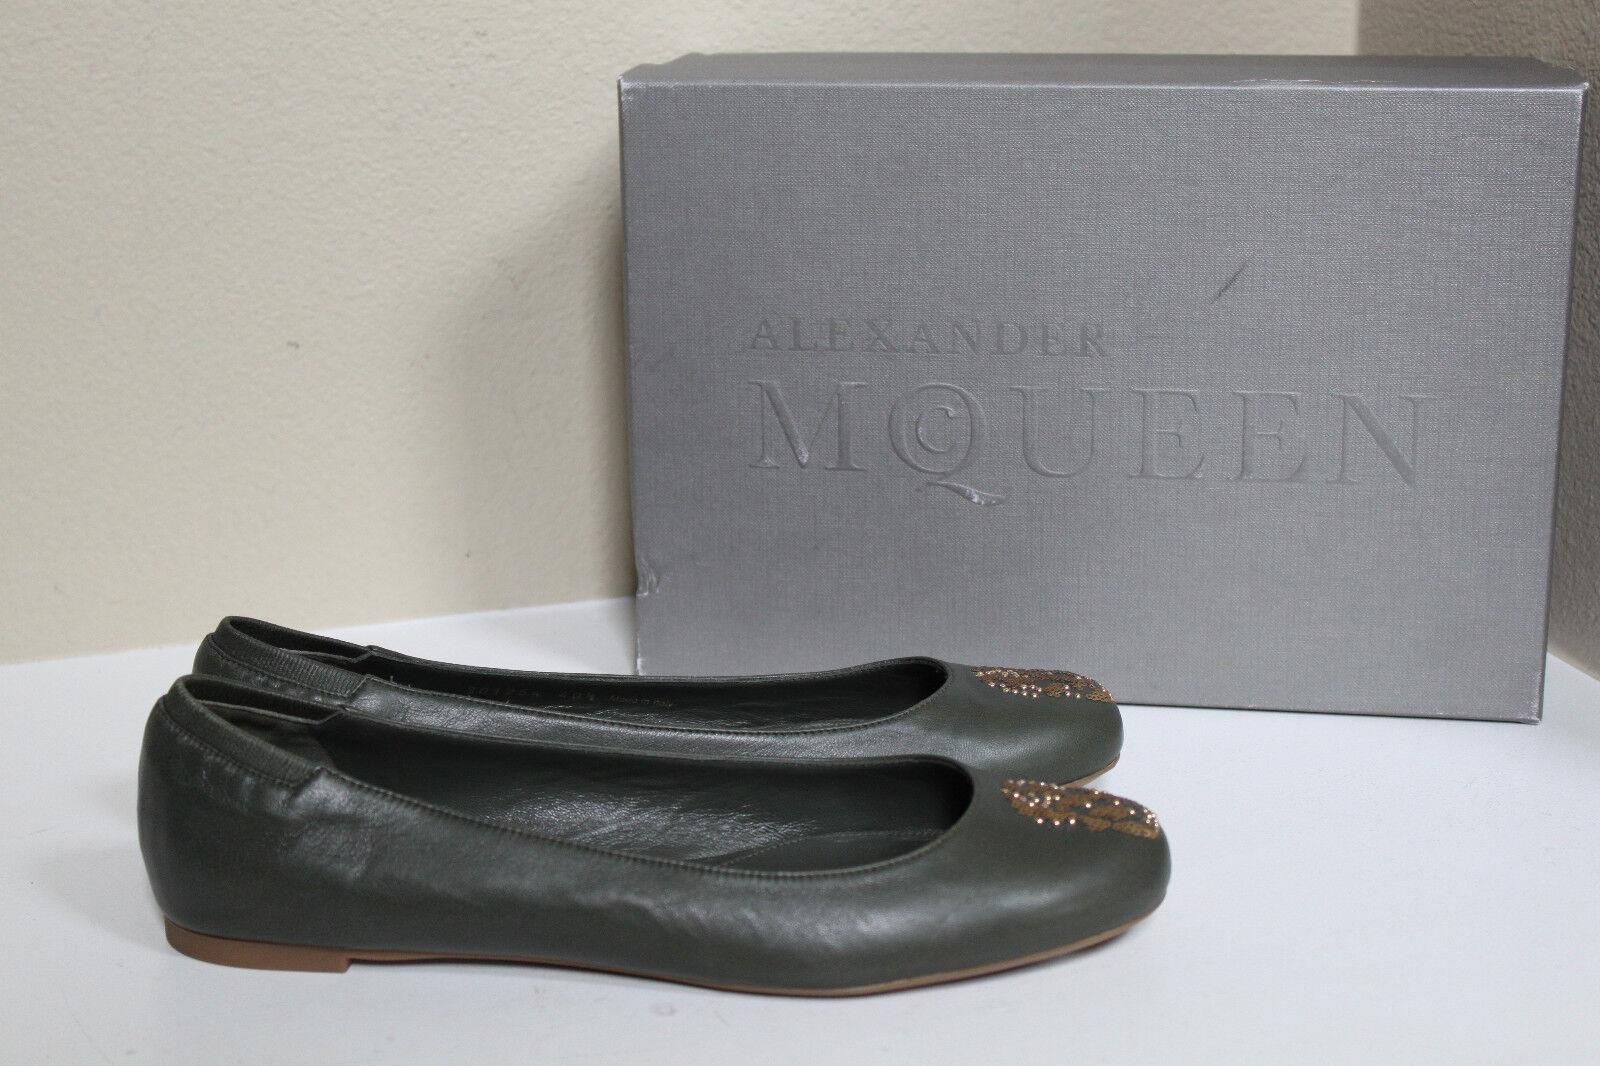 New sz 10 10 10   40.5 Alexander McQueen vert Leather Sequined Skull Ballet flat chaussures 3ba69b